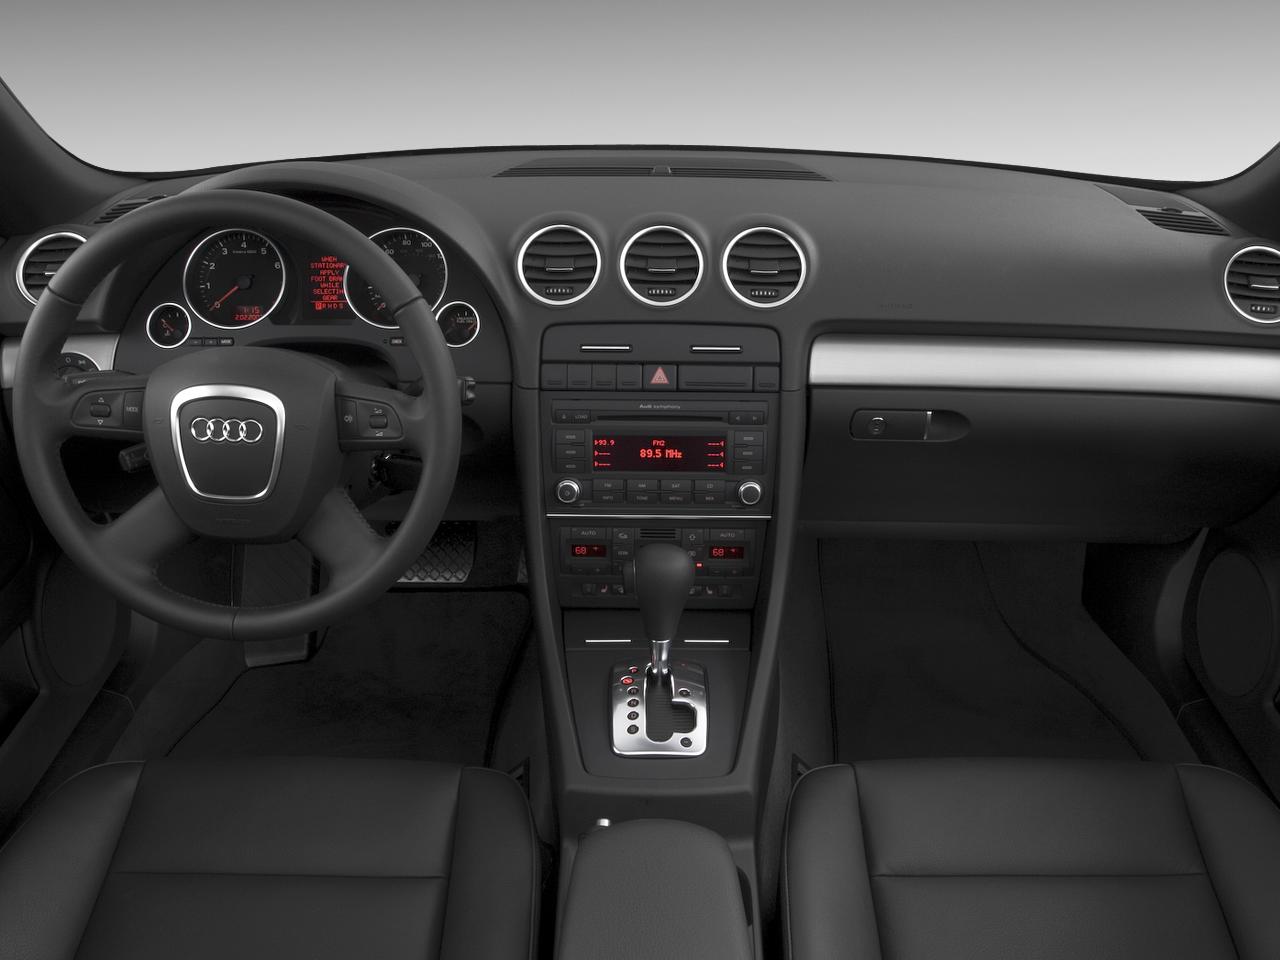 2009 Audi A4 Avant Audi Luxury Wagon Review Automobile Magazine